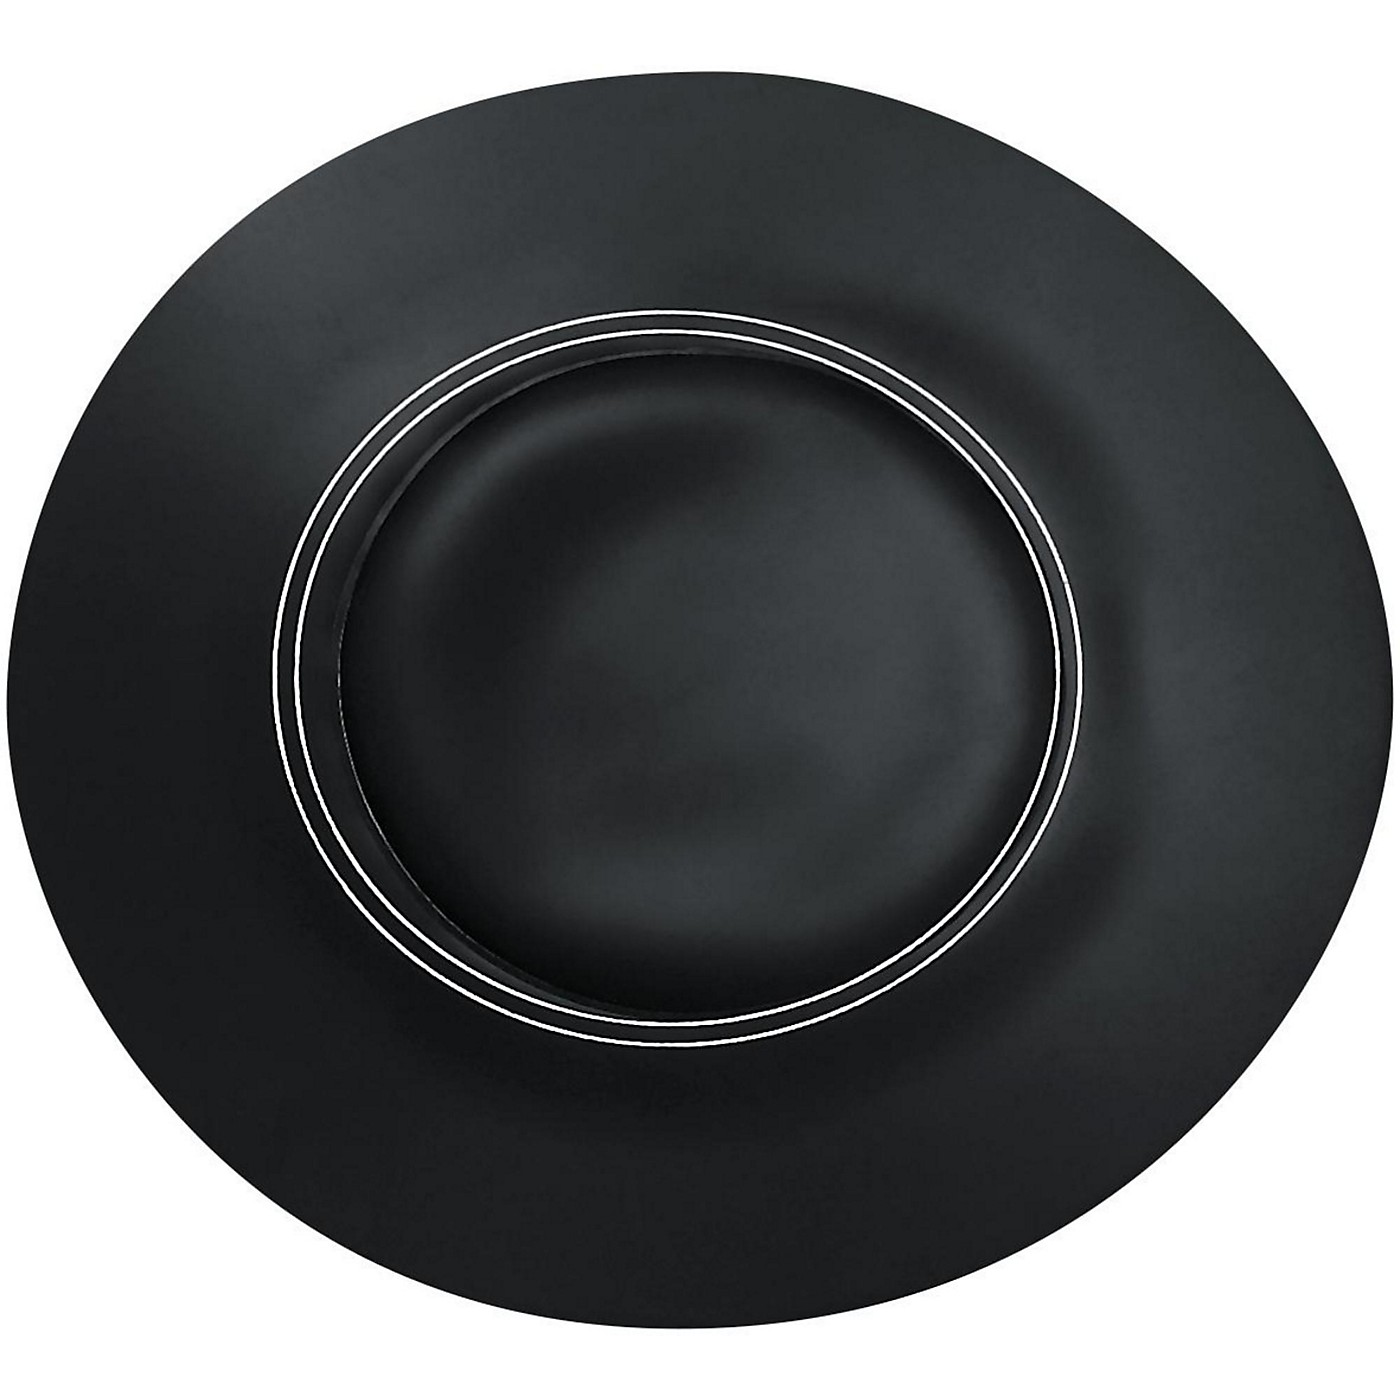 Sound Percussion Labs SPA03 Single Impact Bass Drum Click Pad thumbnail